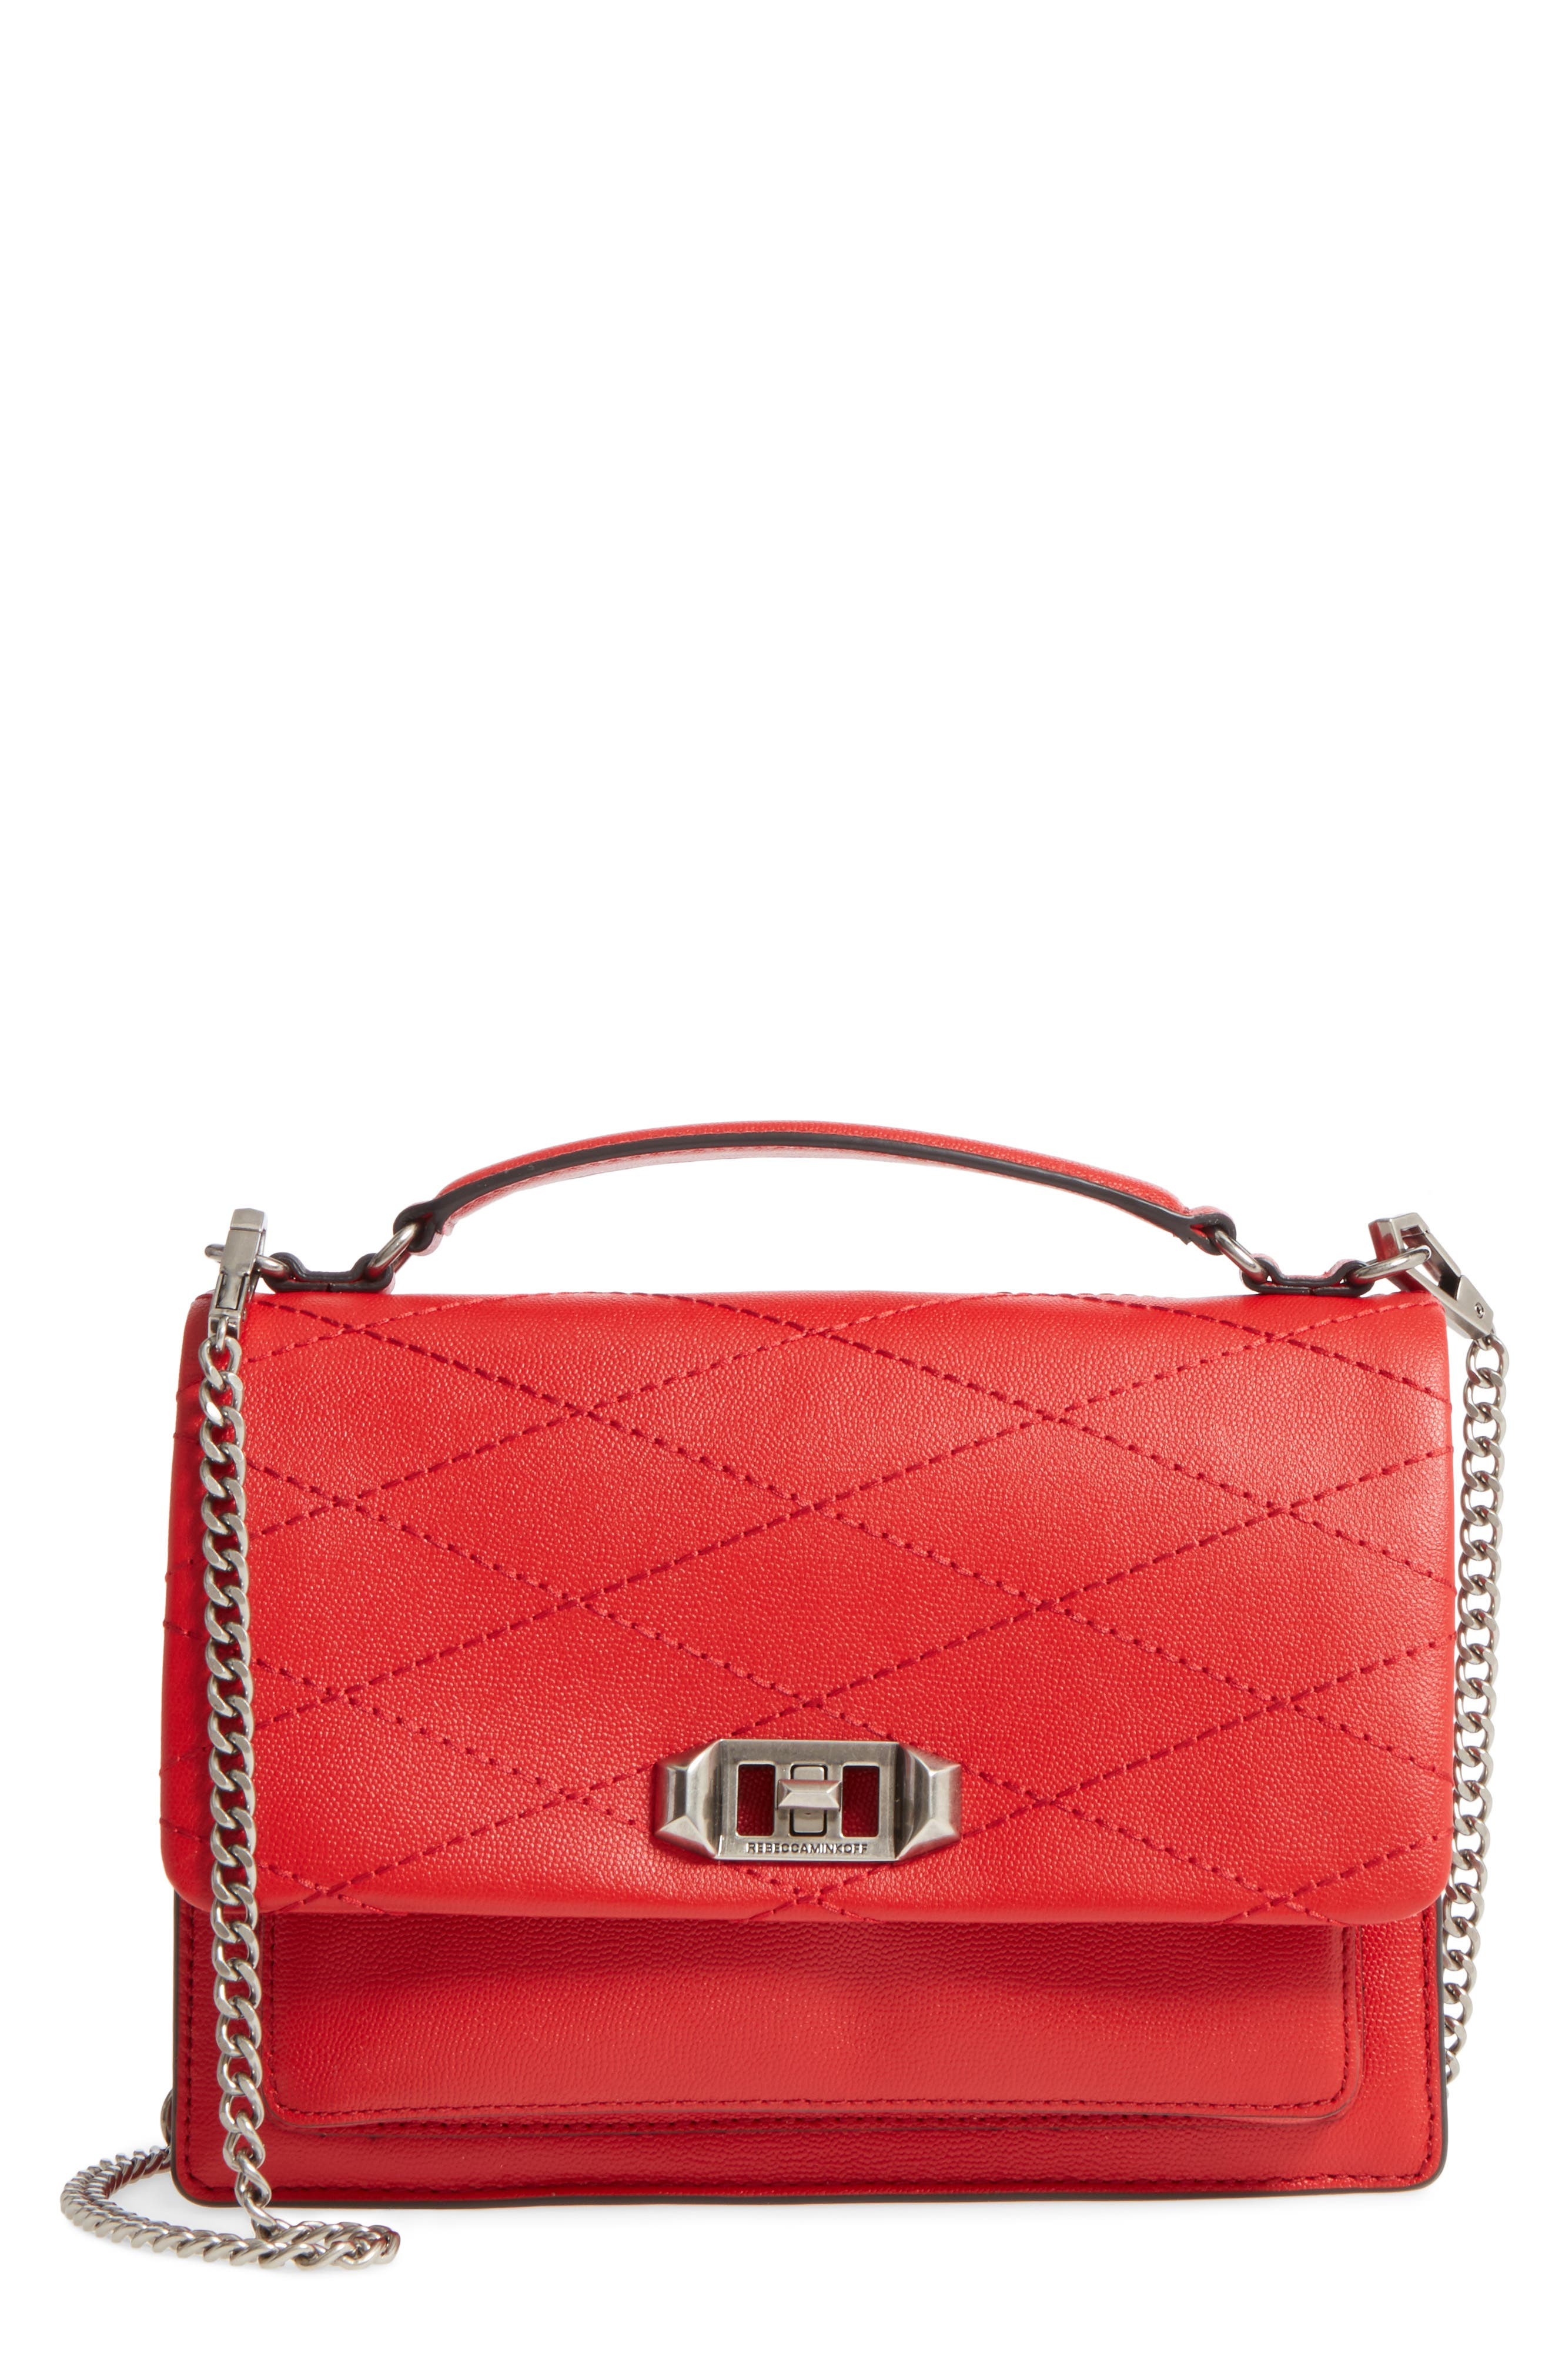 Main Image - Rebecca Minkoff Medium Je T'aime Convertible Leather Crossbody Bag